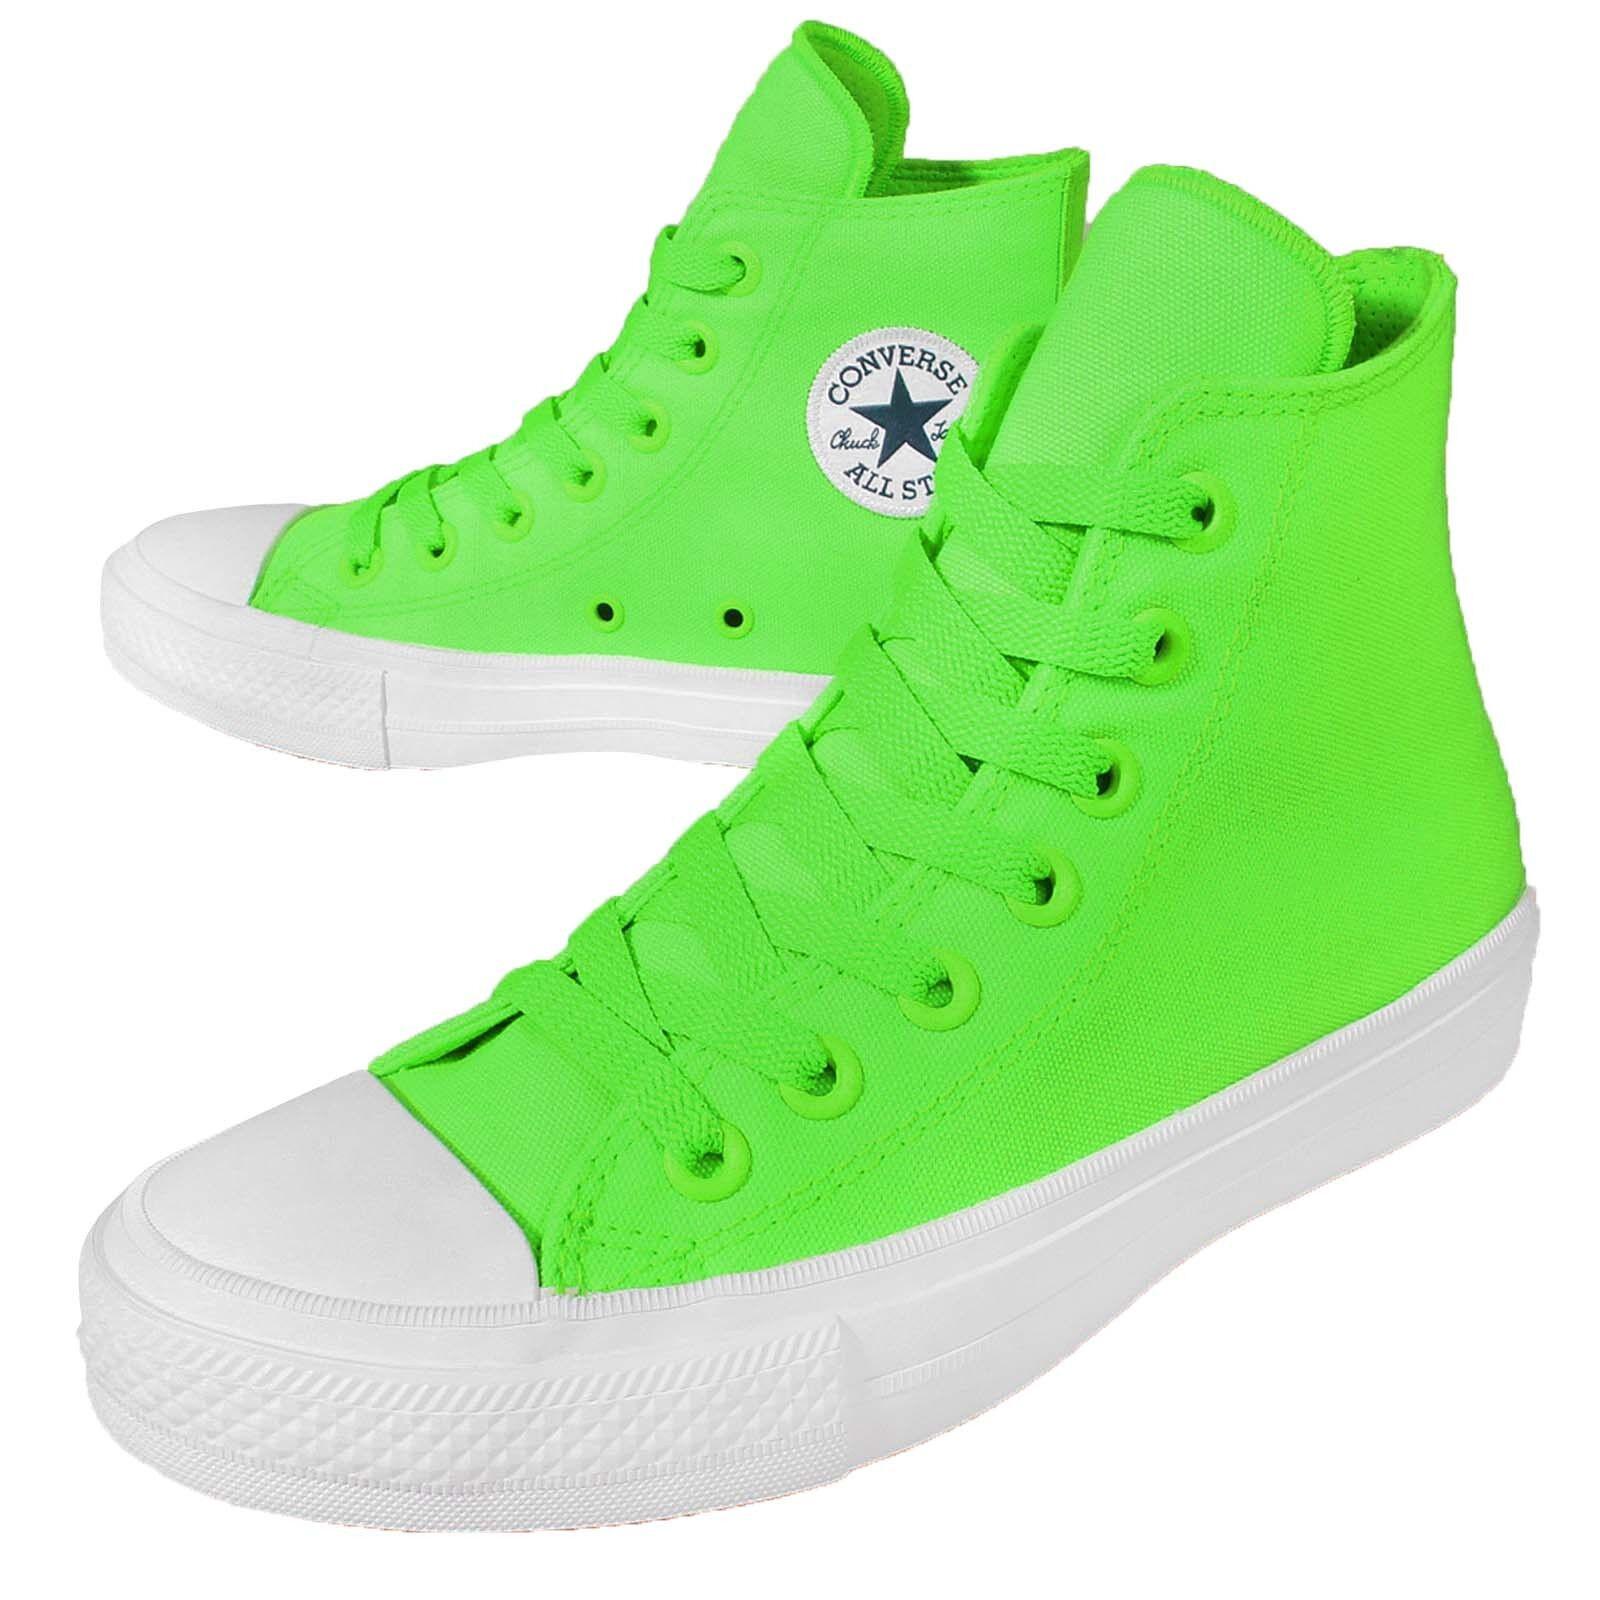 Converse Chuck Taylor All Star II 2 Lunarlon Neon verde Plimsolls Shoes 151118C